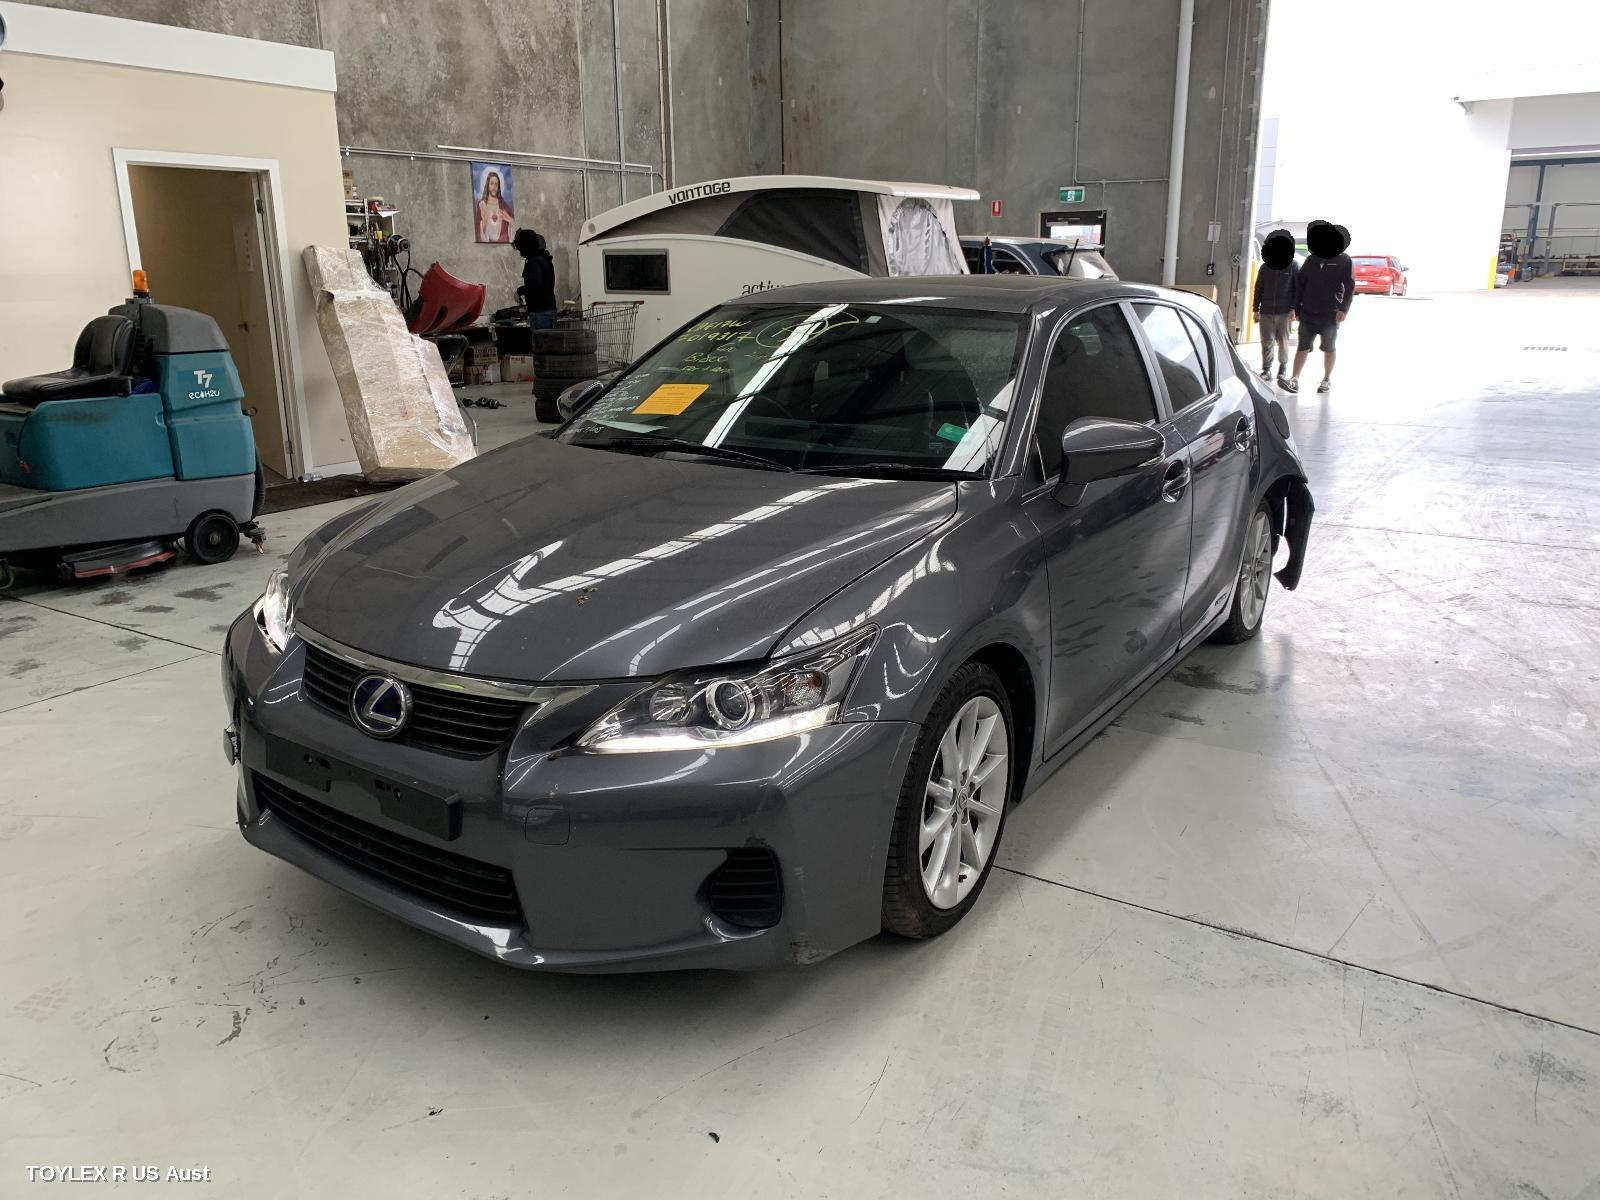 Lexus CT200H ZWA10R Luxury 2ZR-FXE 1.8L Engine Automatic FWD Transmission 12/10 - Current